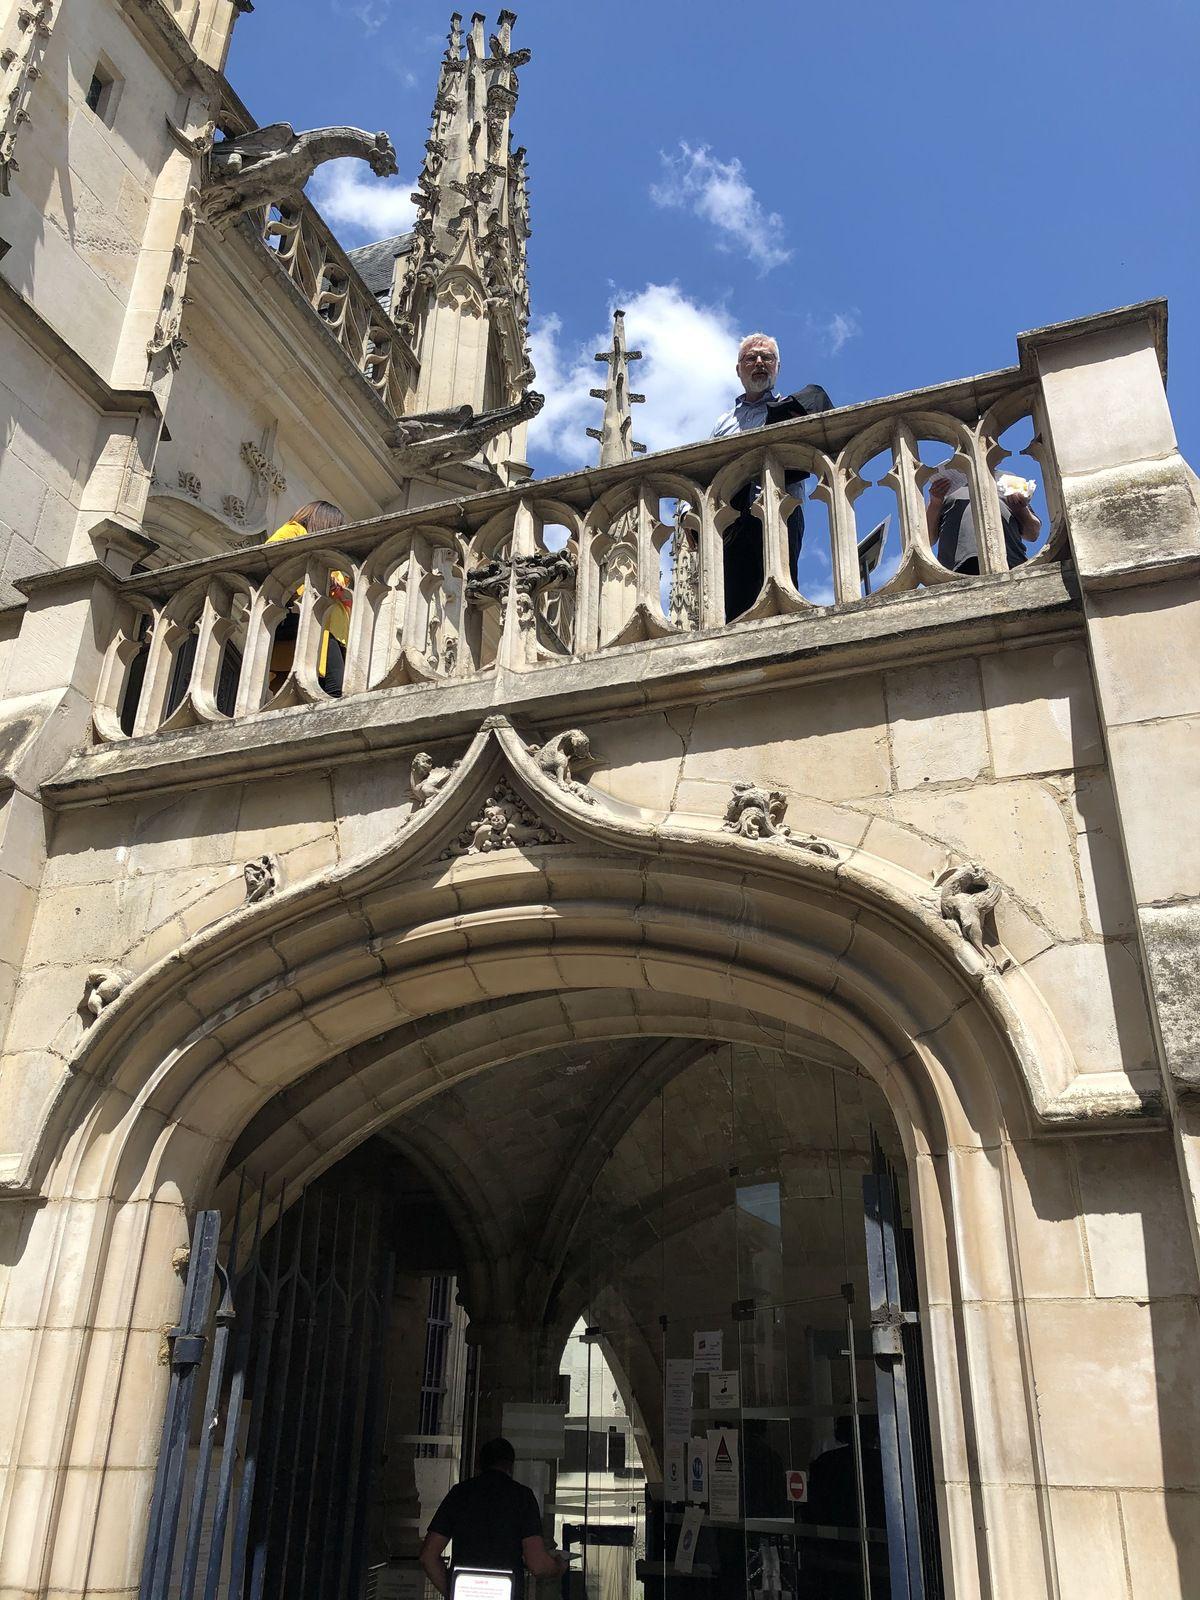 tribunal de Rouen